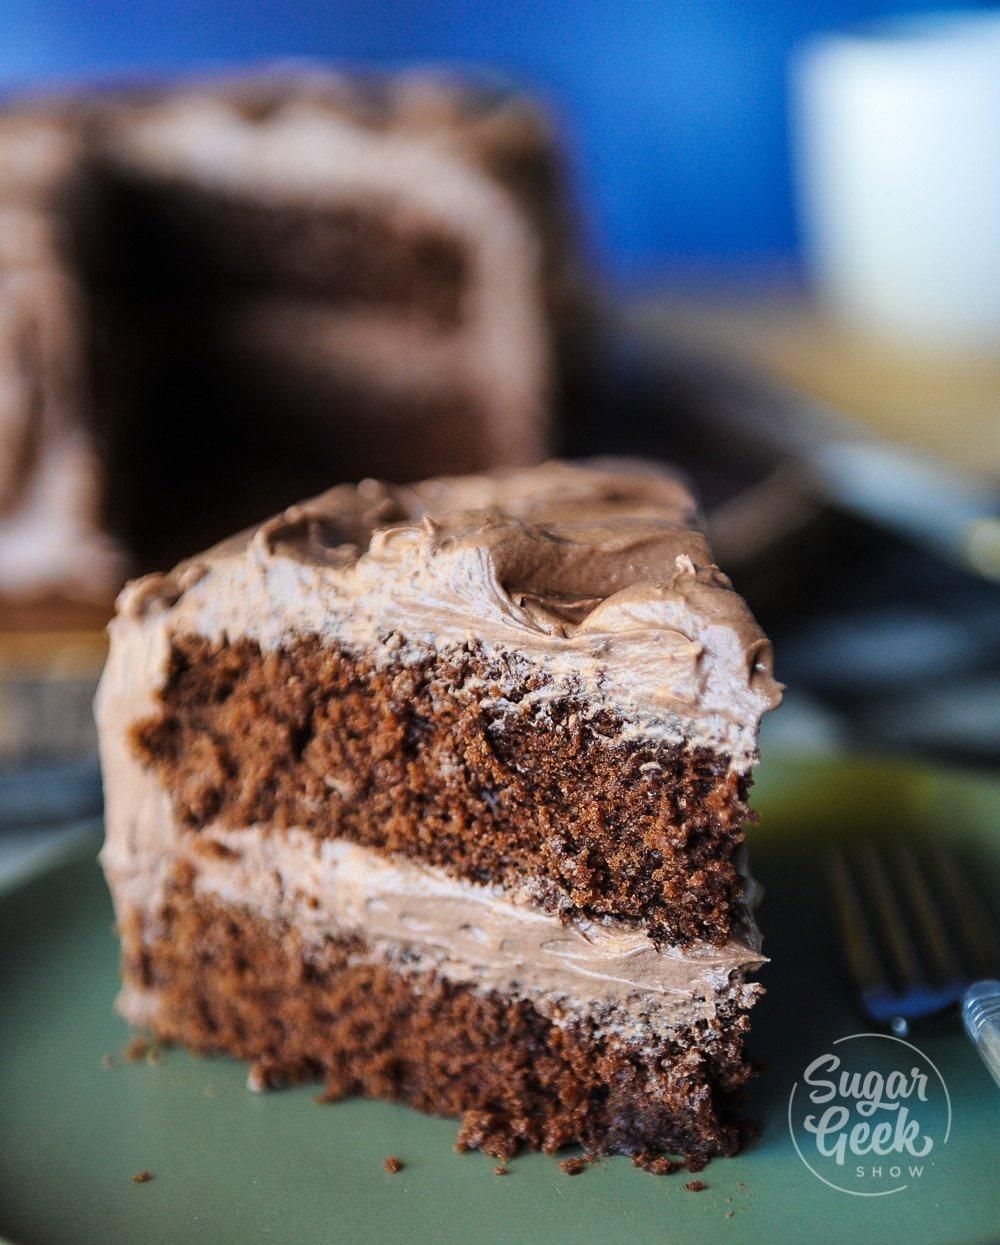 How To Make A Box Cake Taste Like A Wedding Cake.Chocolate Wasc Doctored Cake Mix Sugar Geek Show